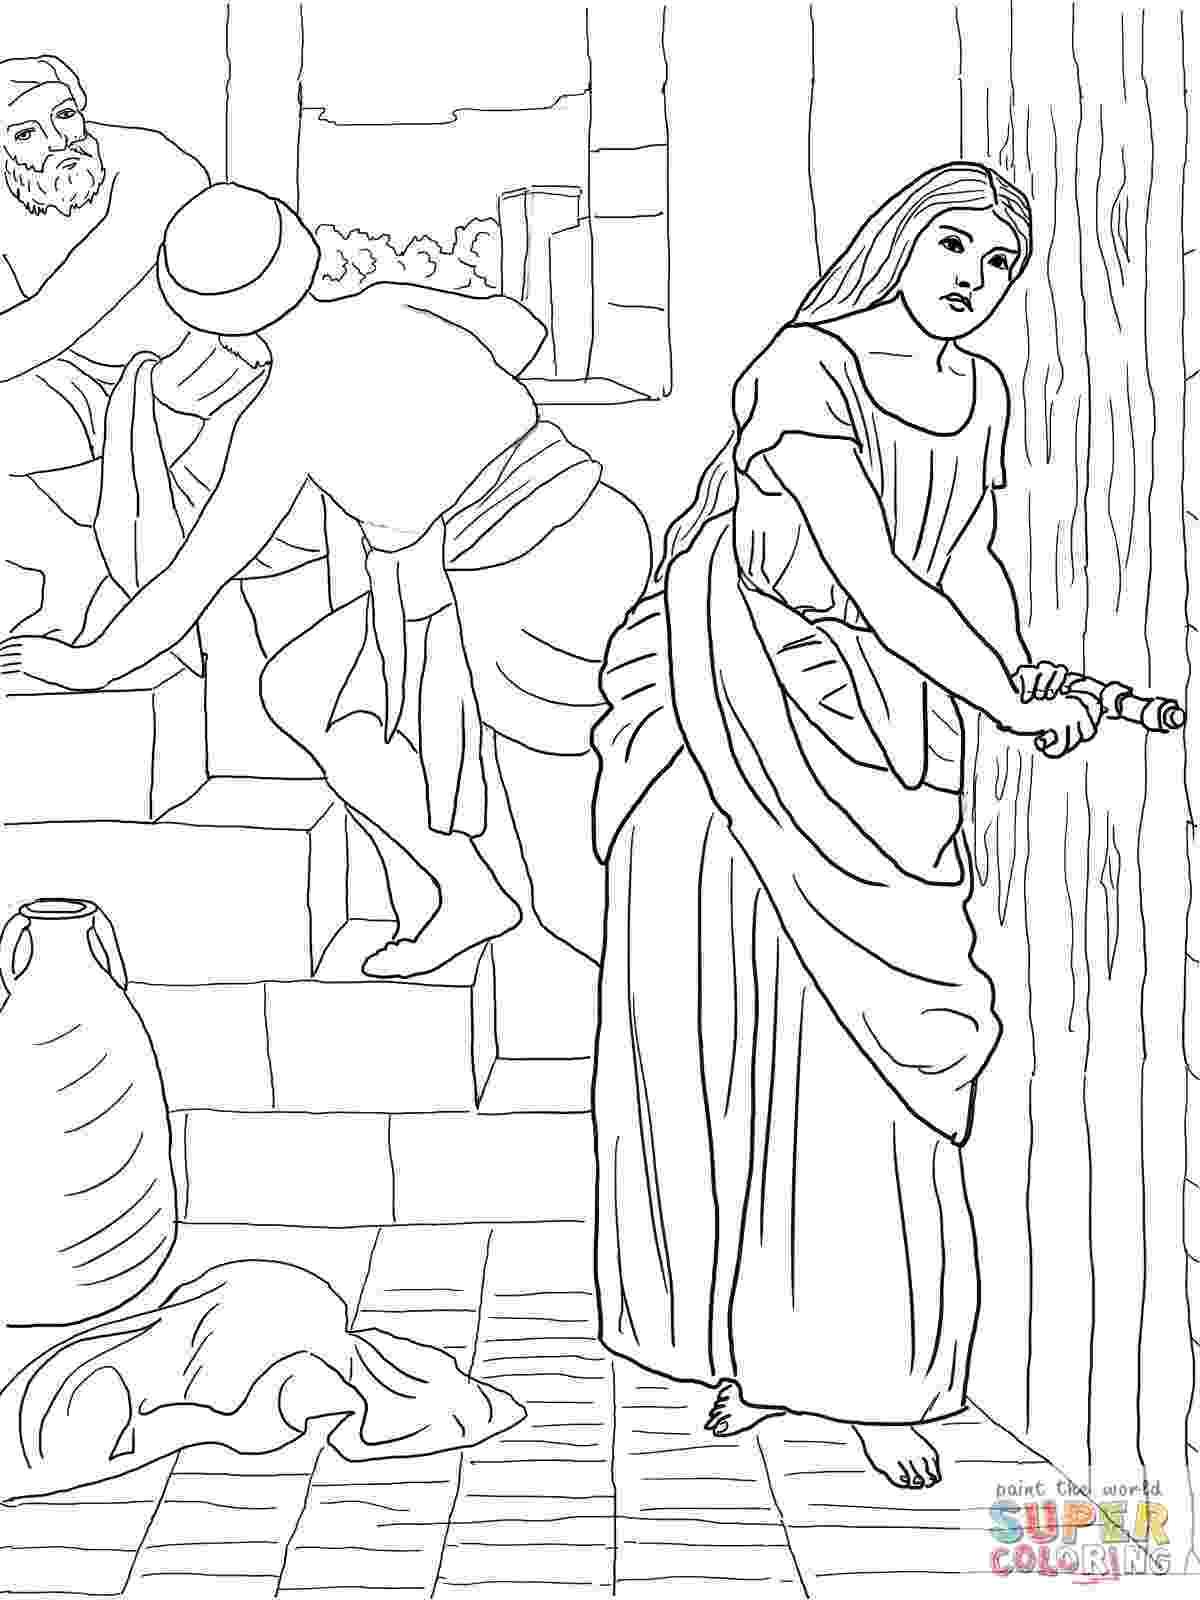 printable coloring sheets bible stories bible christmas coloring pages coloring home sheets stories bible printable coloring